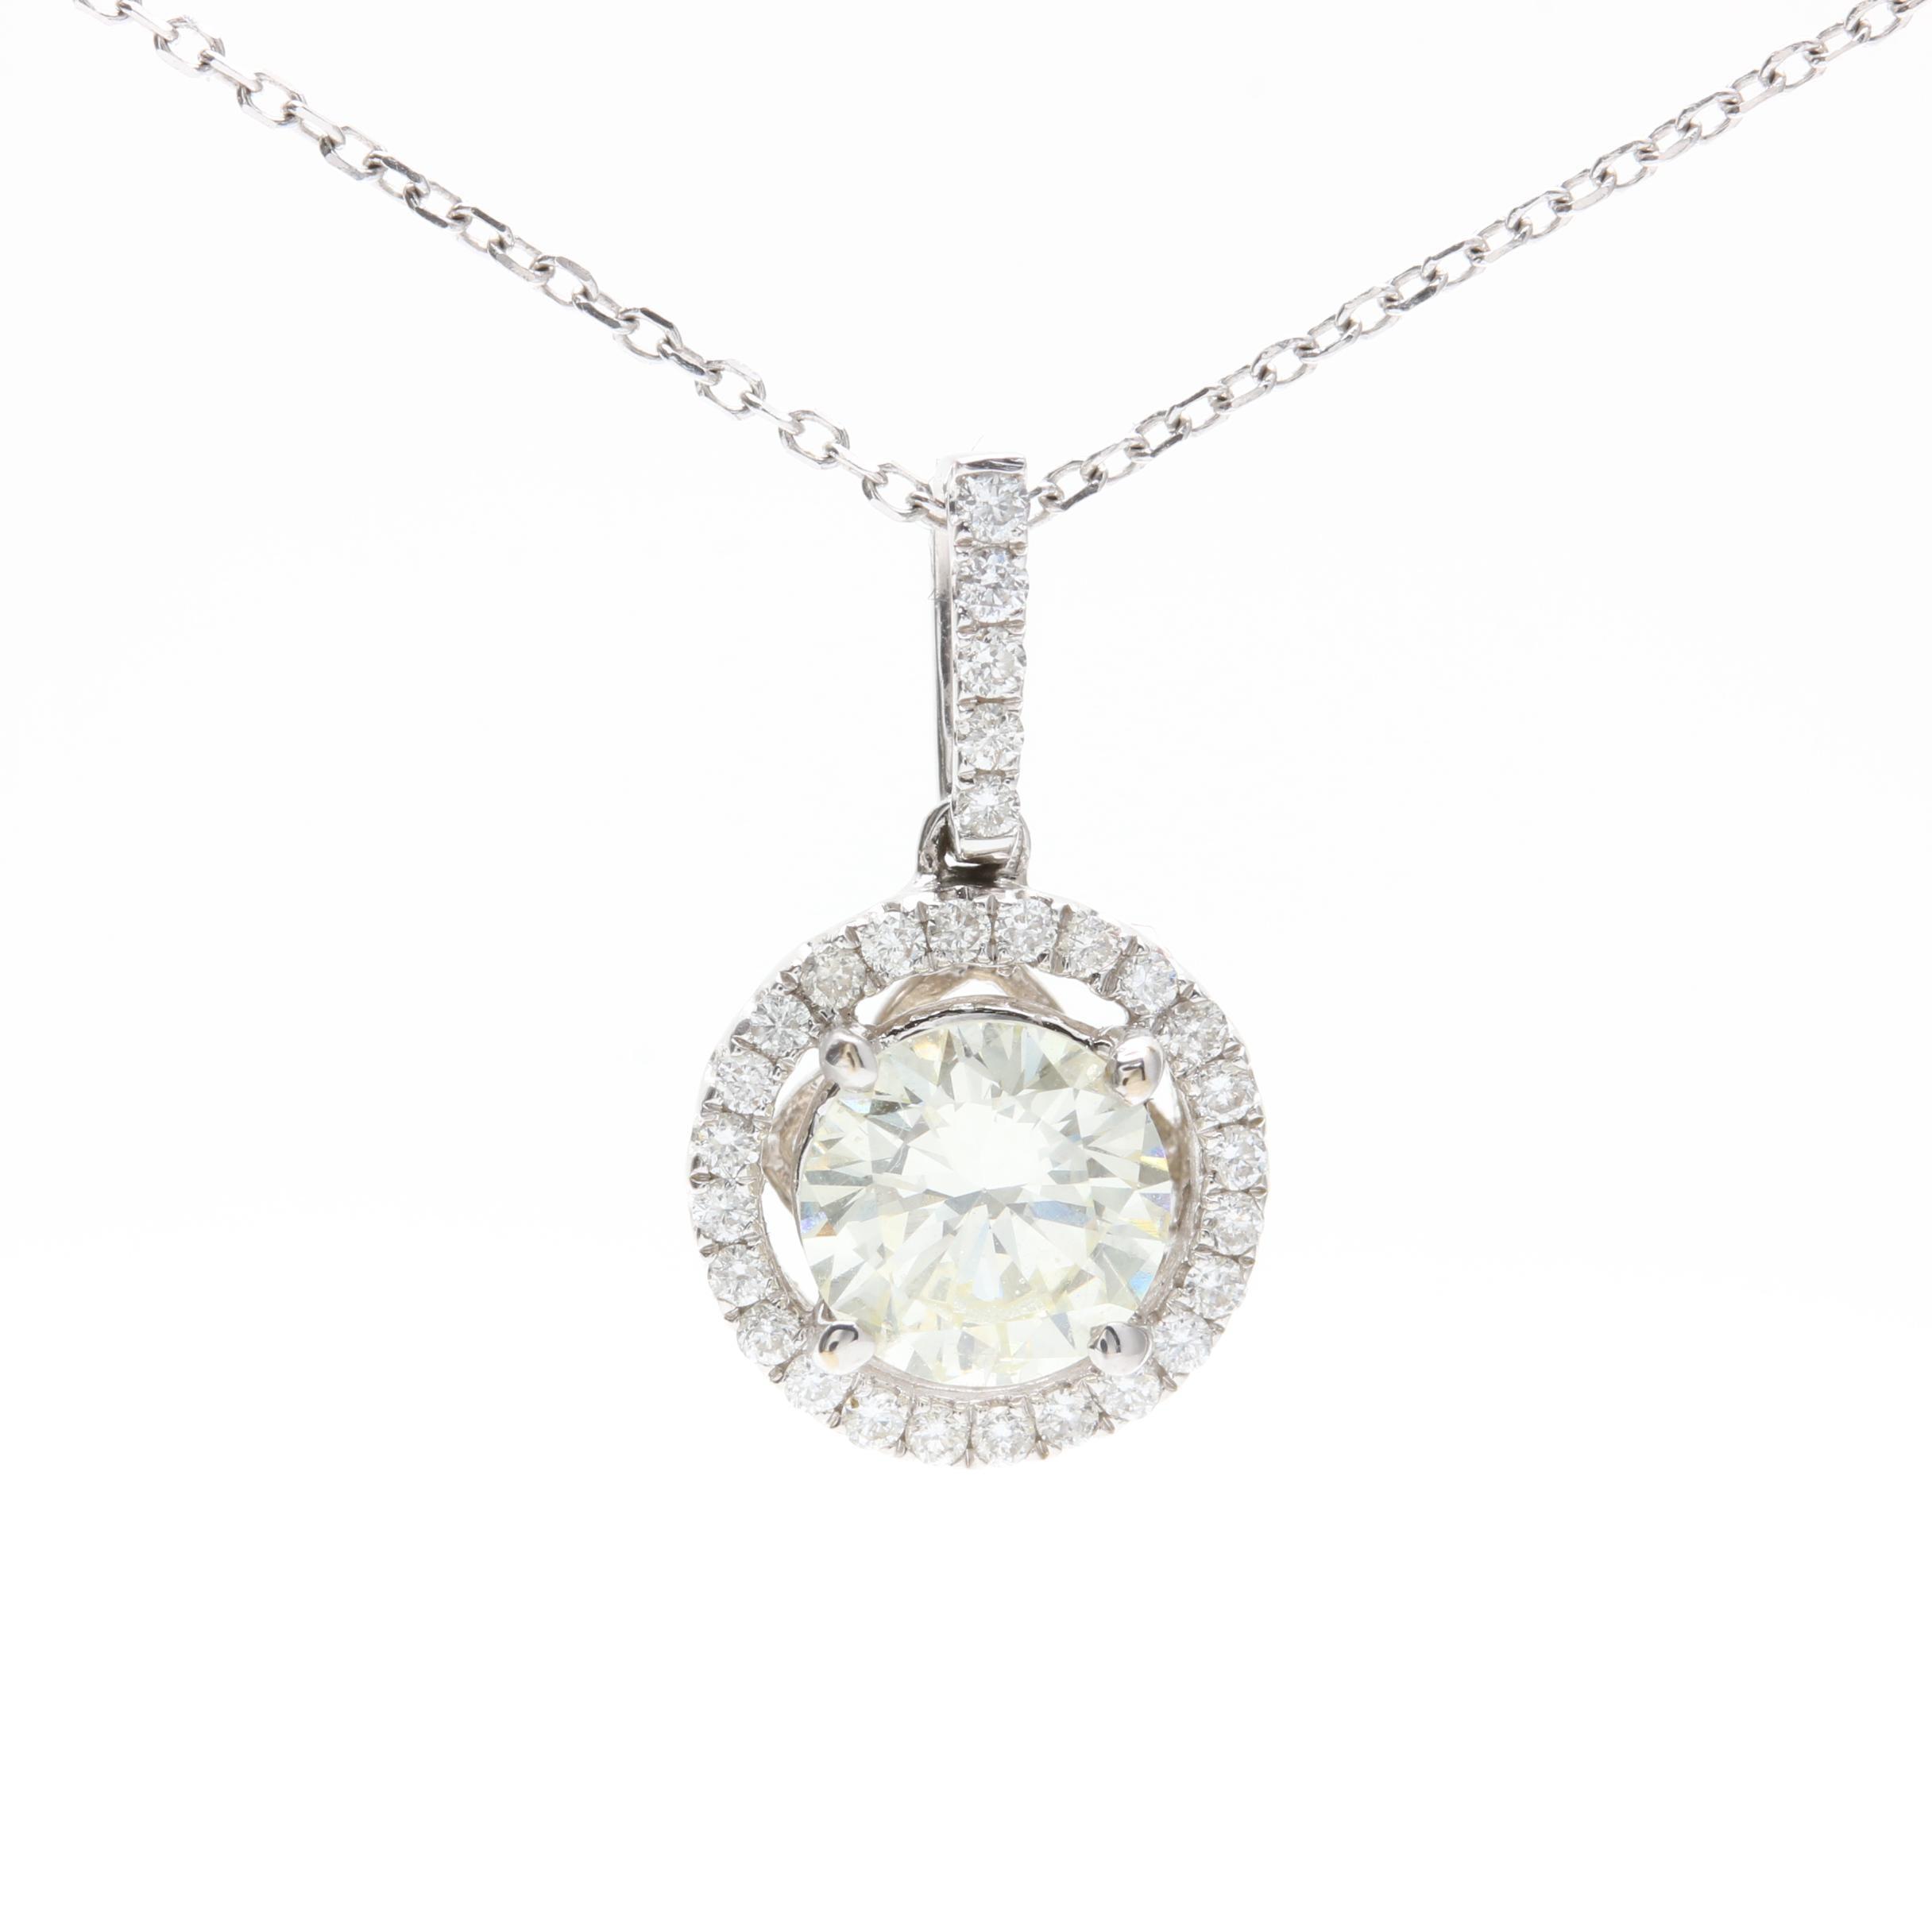 14K and 18K White Gold 0.88 CTW Diamond Pendant Necklace